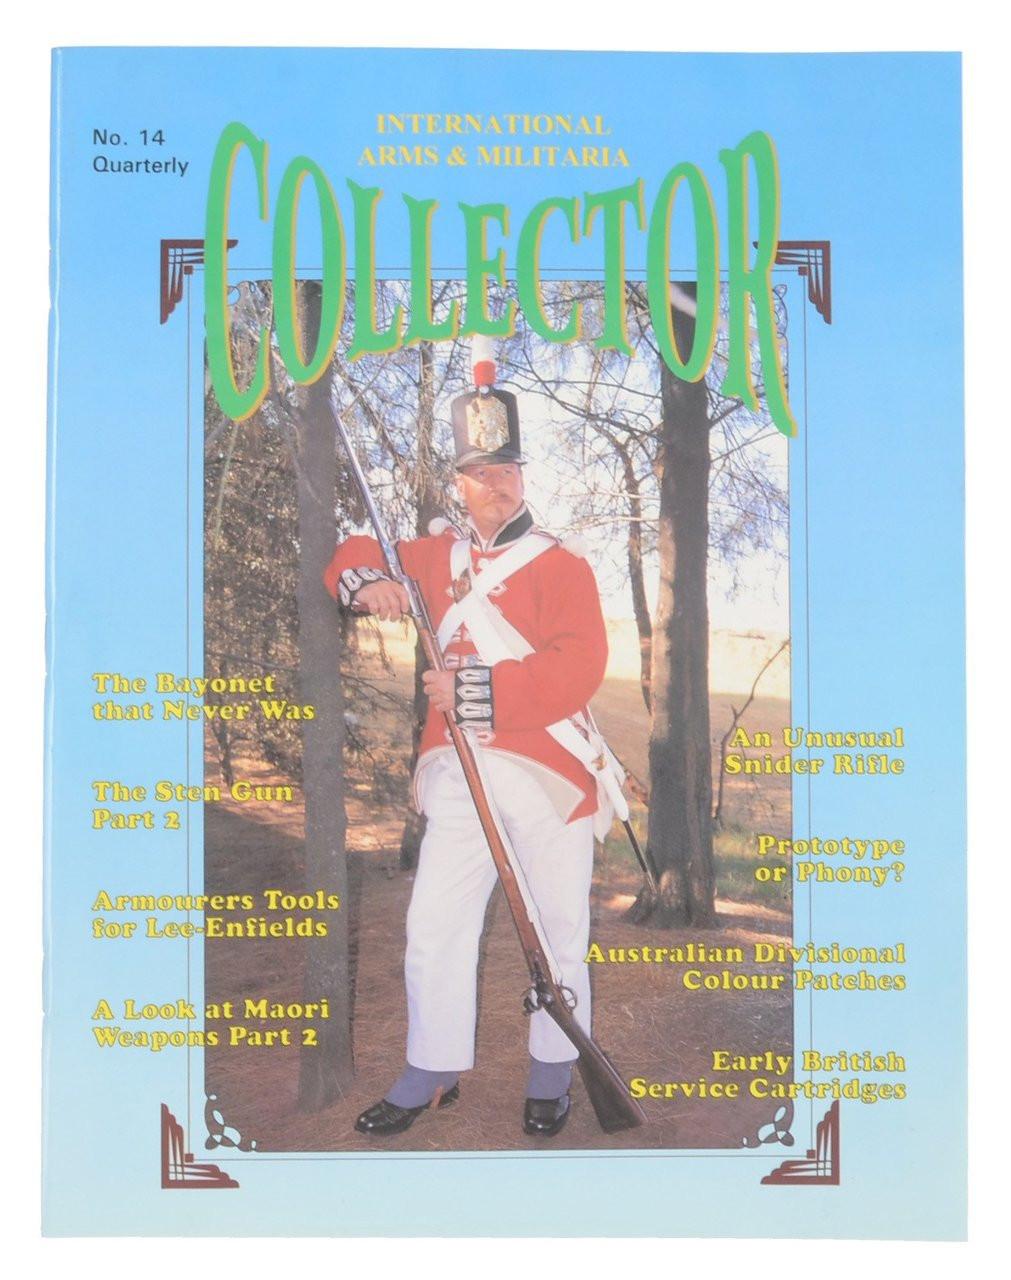 International Arms & Militaria Collector No. 14